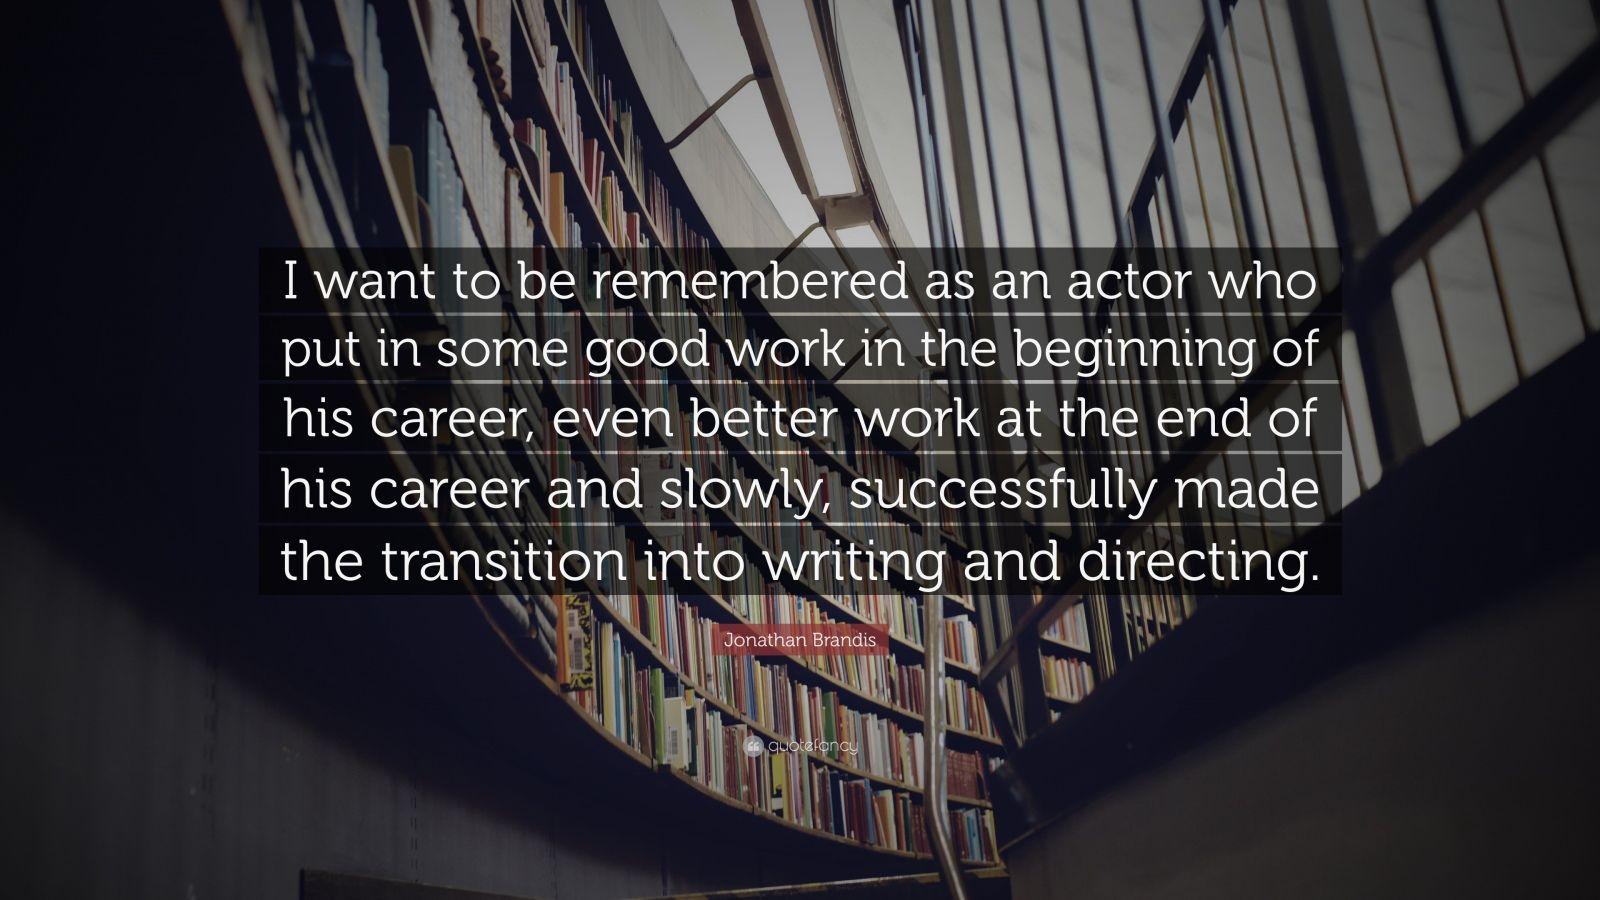 Toktar aubakirov essay writer